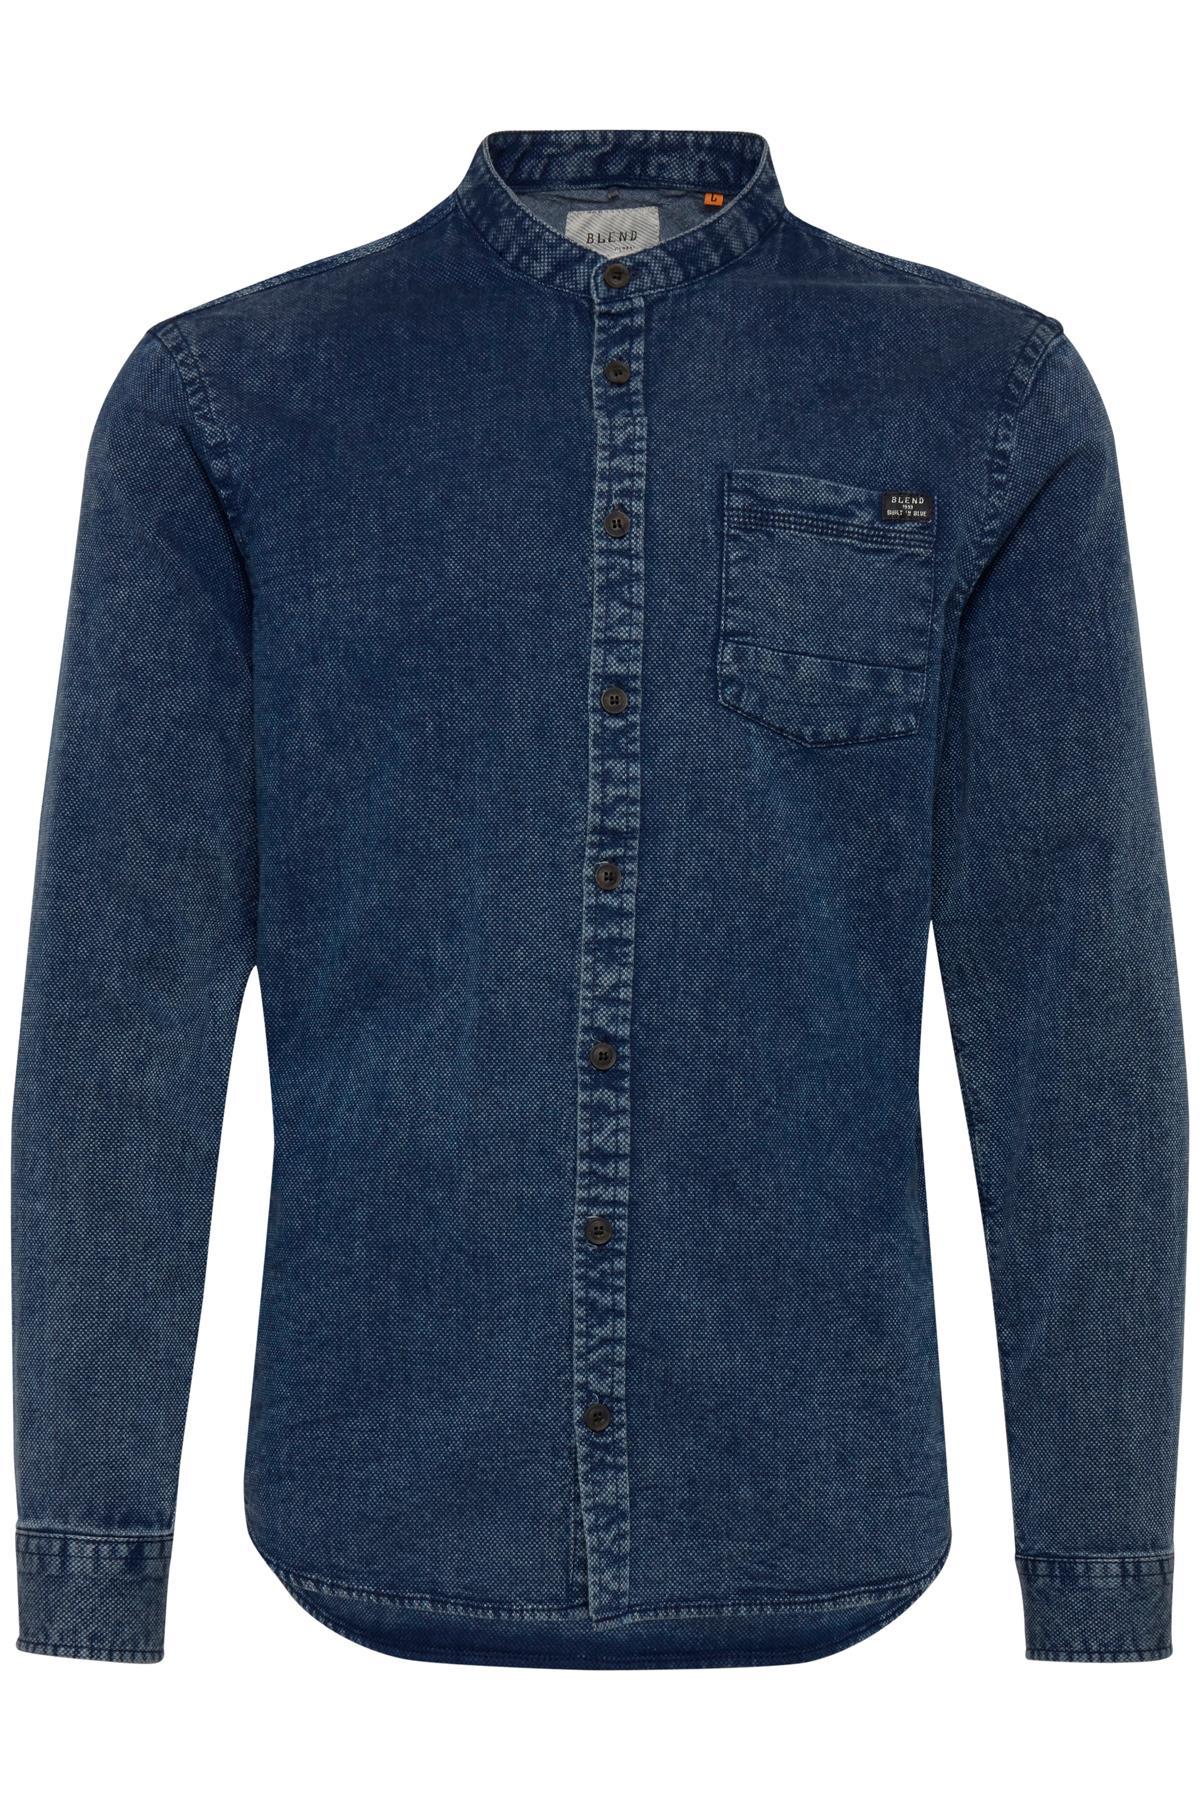 Mood Indigo Blue Langærmet skjorte – Køb Mood Indigo Blue Langærmet skjorte fra str. S-XXL her